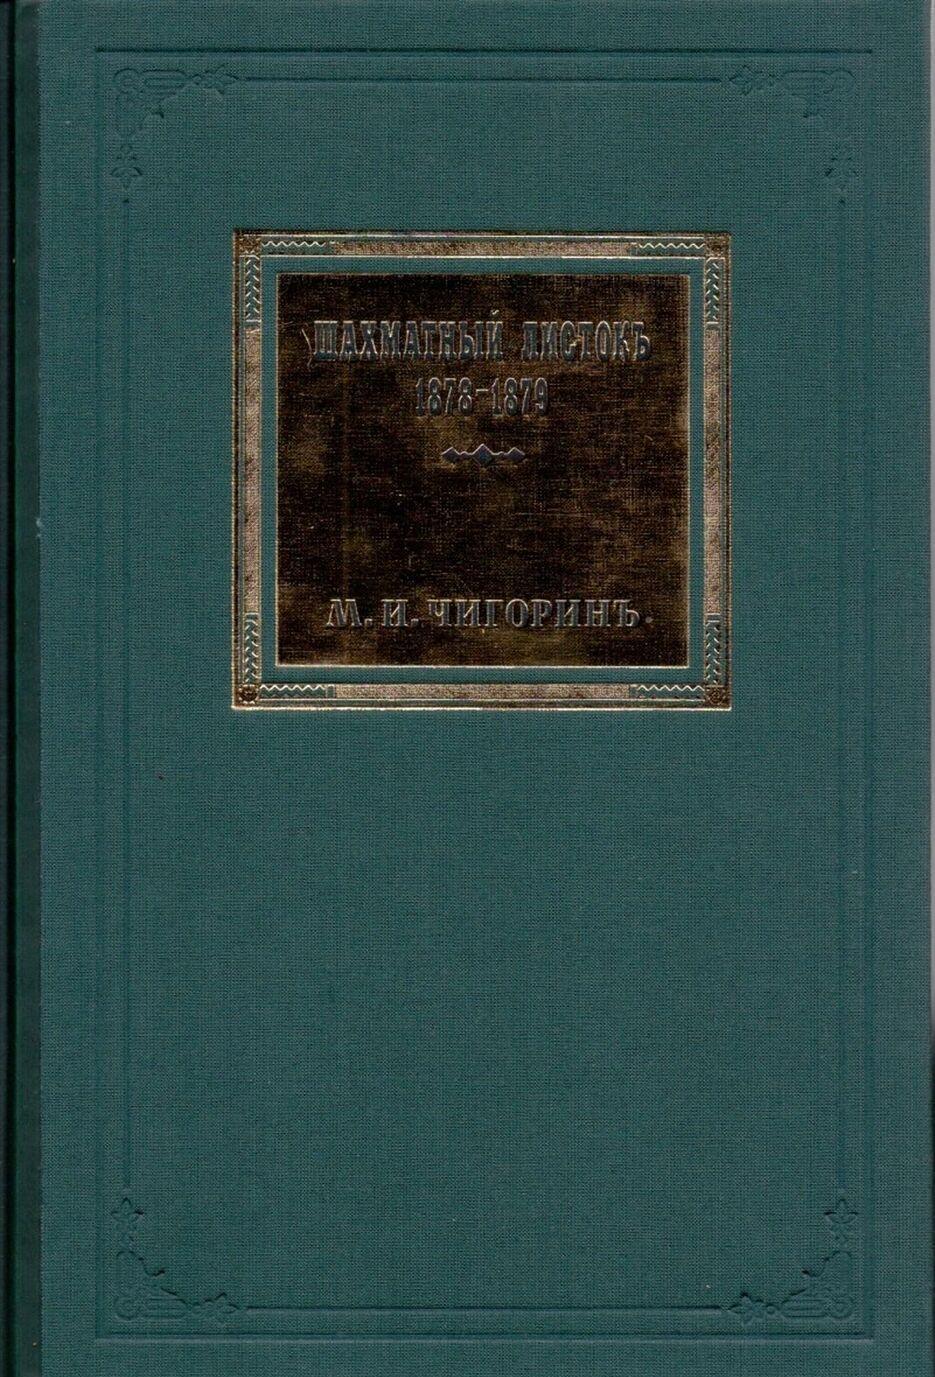 Шахматный листокъ.1878-1879